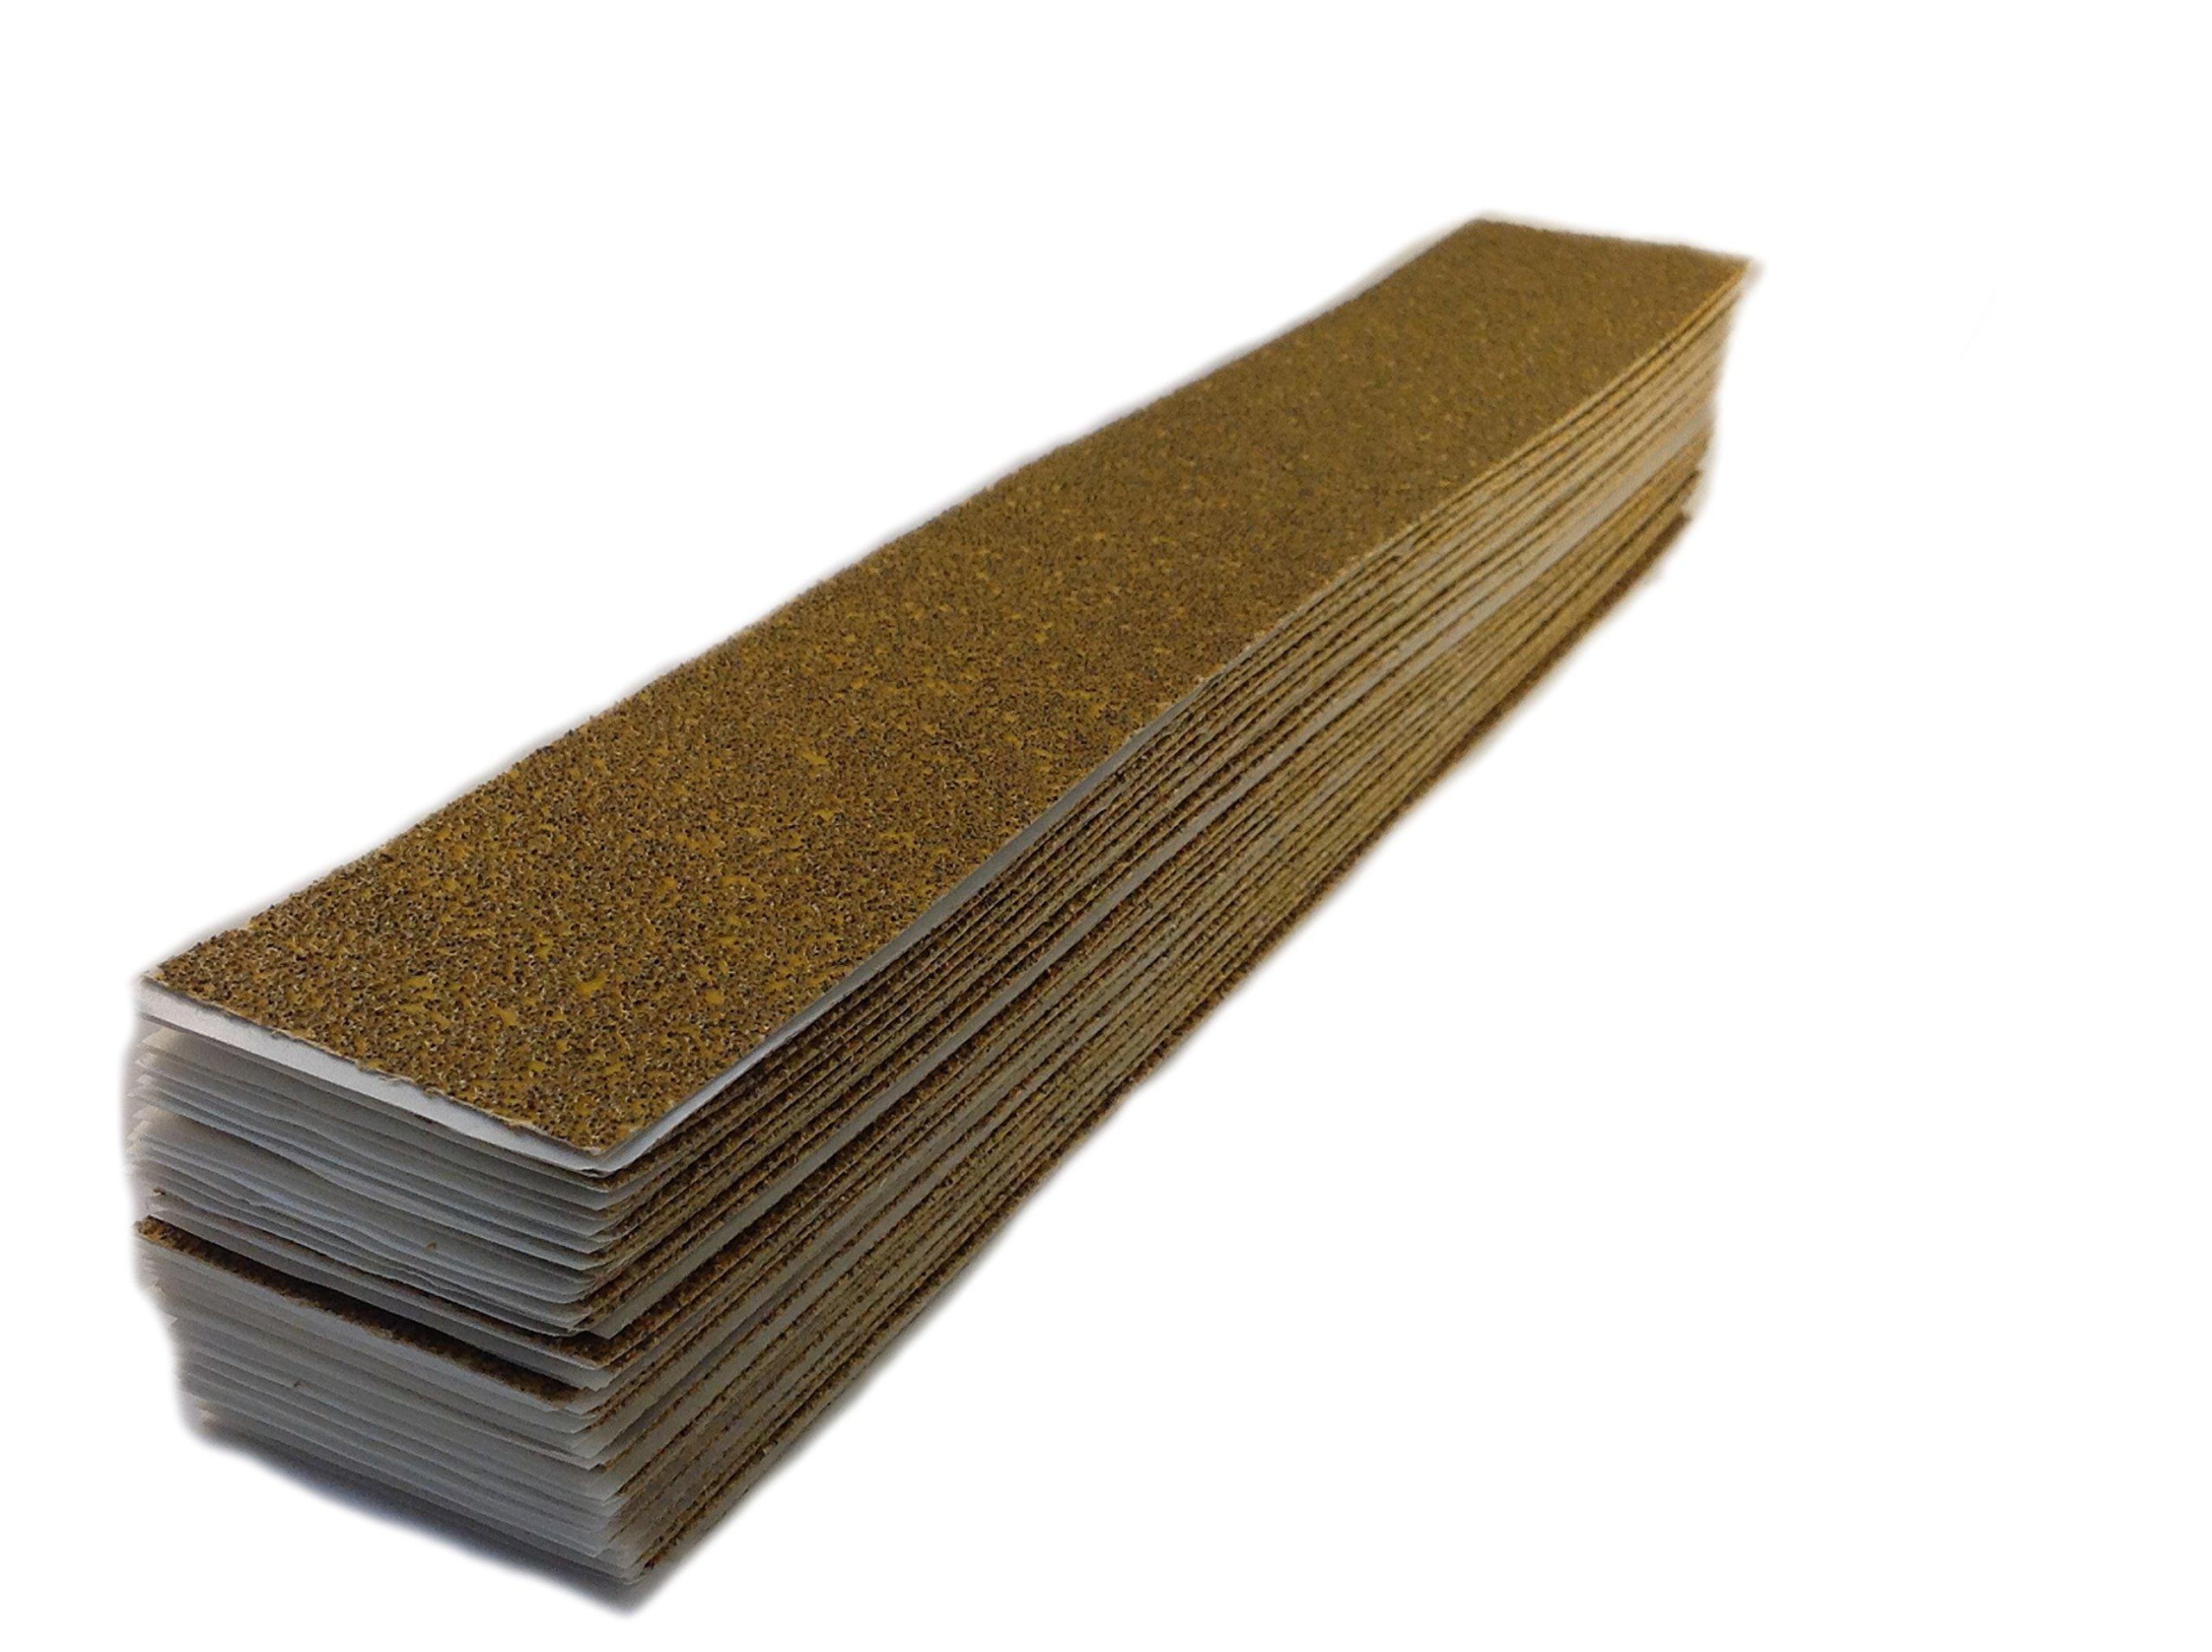 Karebac HSLBY36 Longboard 2-3/4'' x 16-1/2'' 36 Grit PSA Sticky-Back Sheets - Gold Aluminum Oxide (50 Pack)